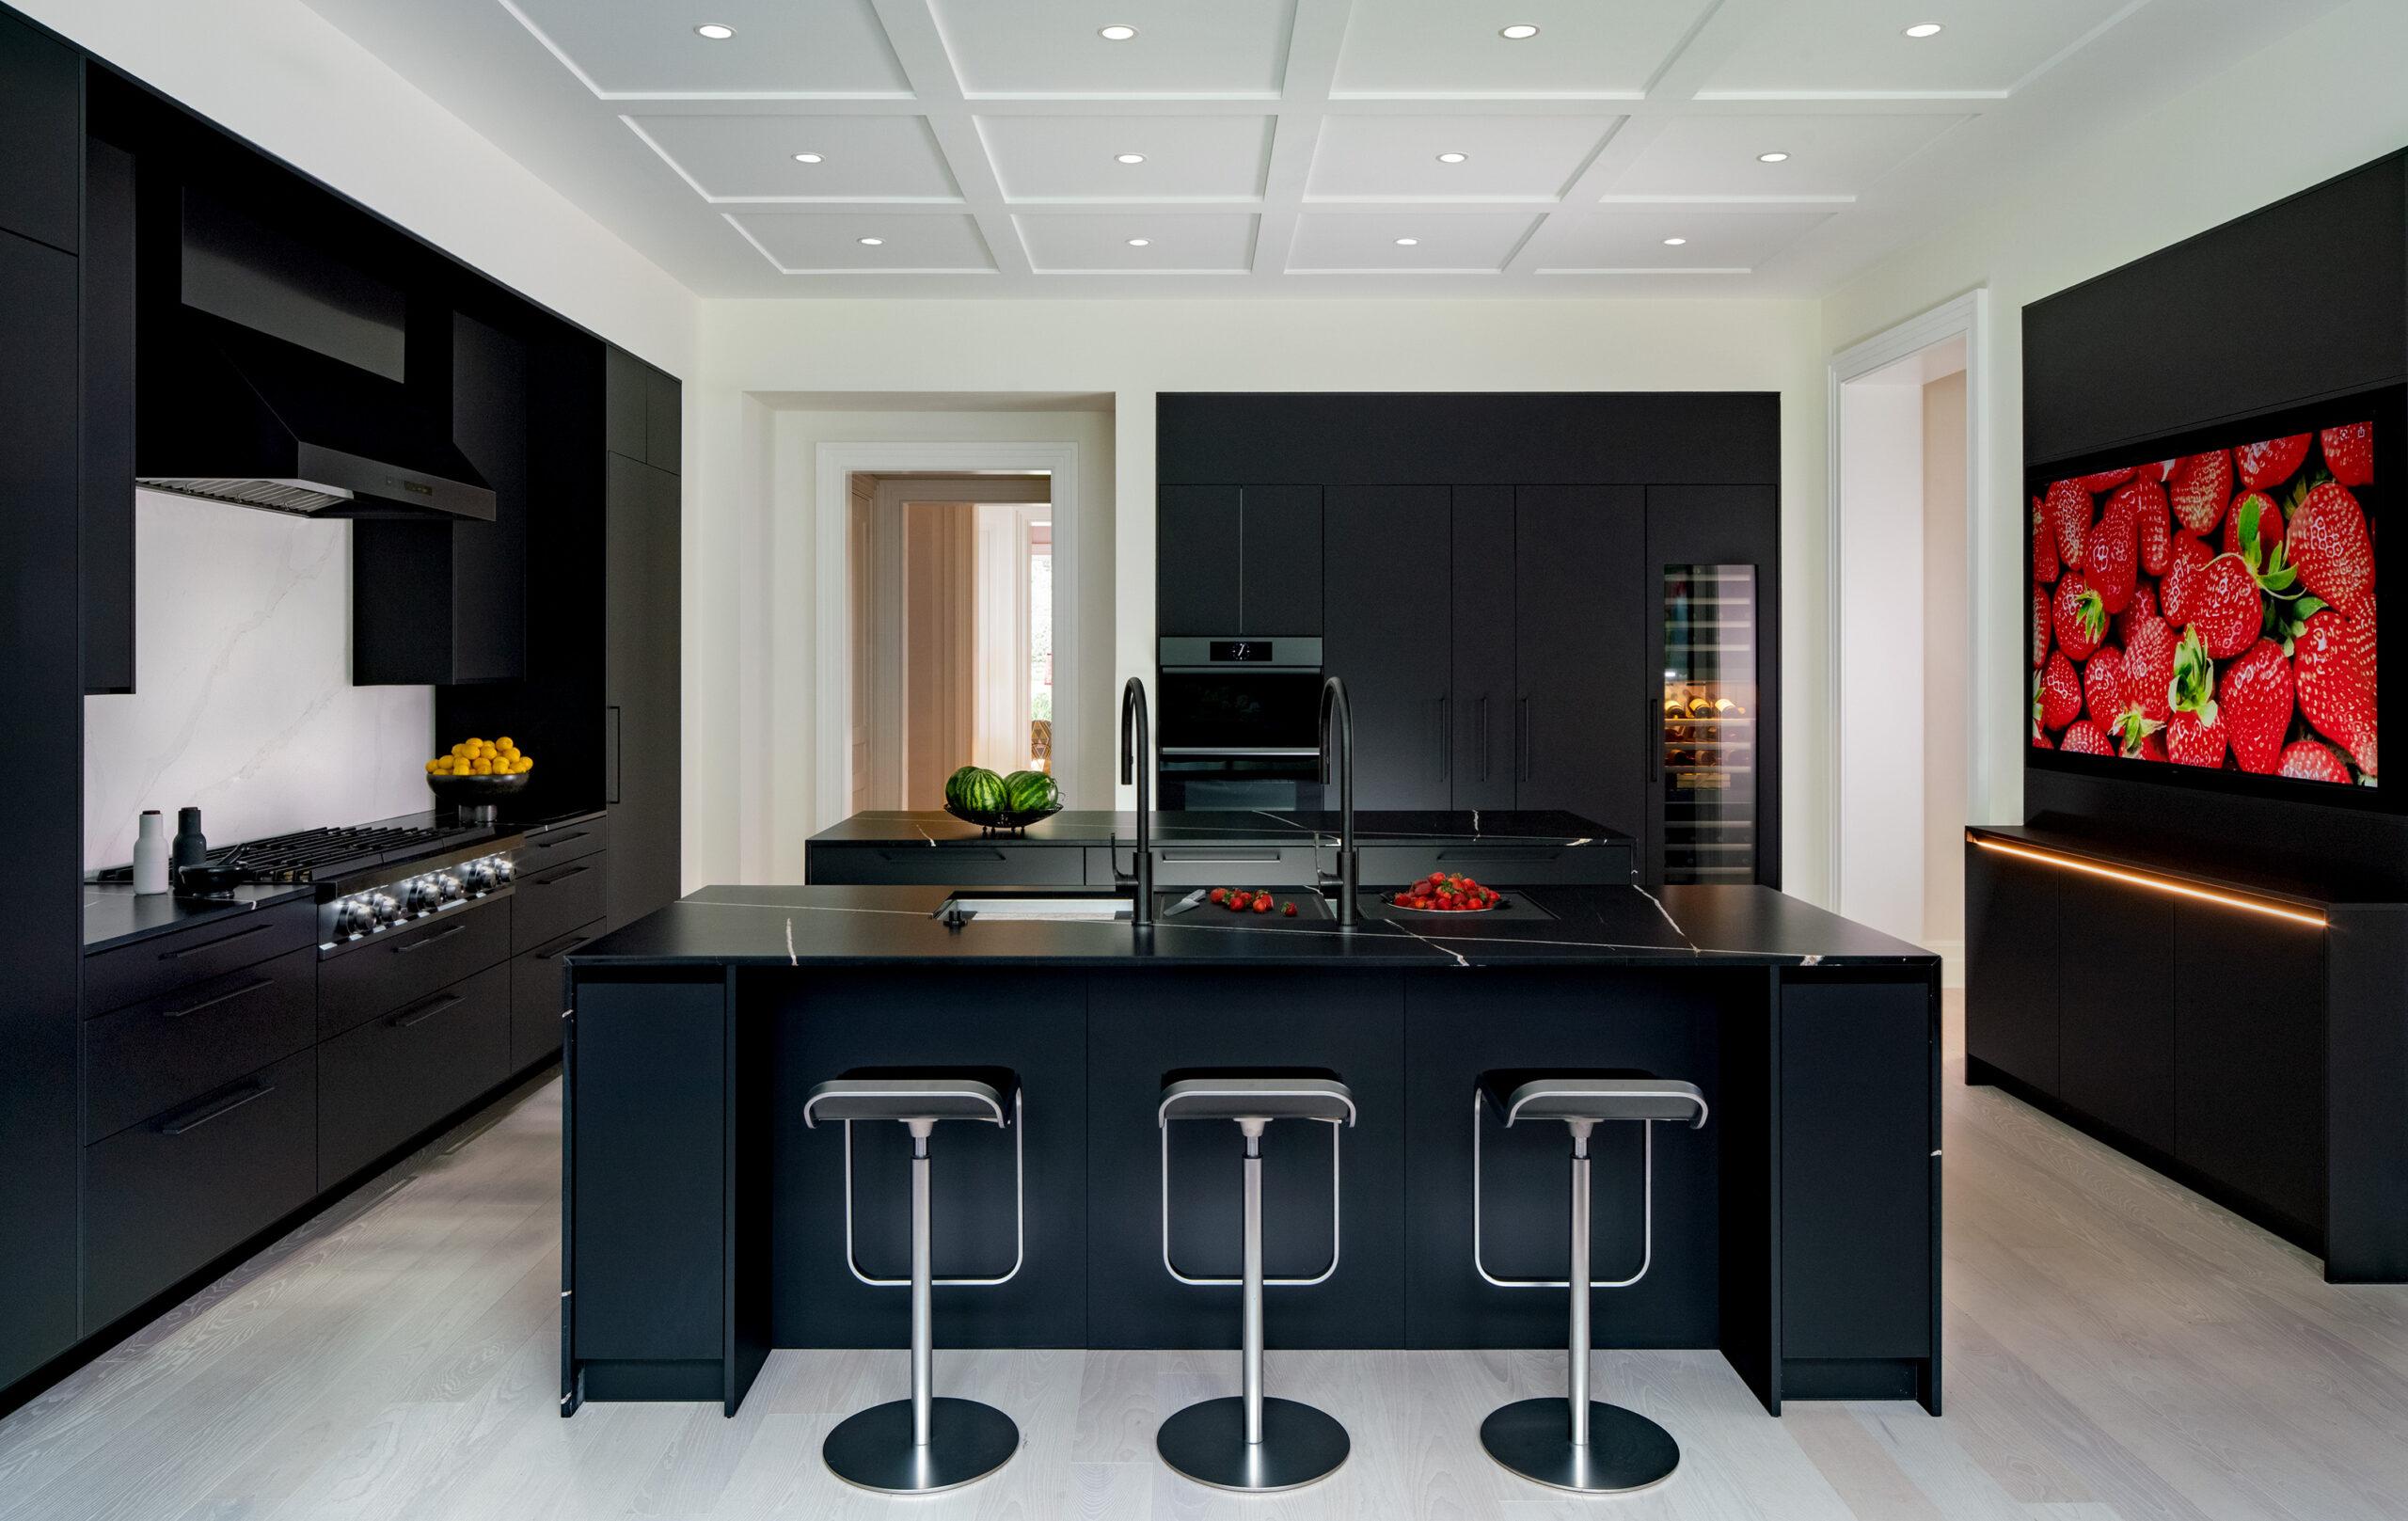 Luxury Kitchen Design & Remodeling in Washington D.C, Maryland and VA